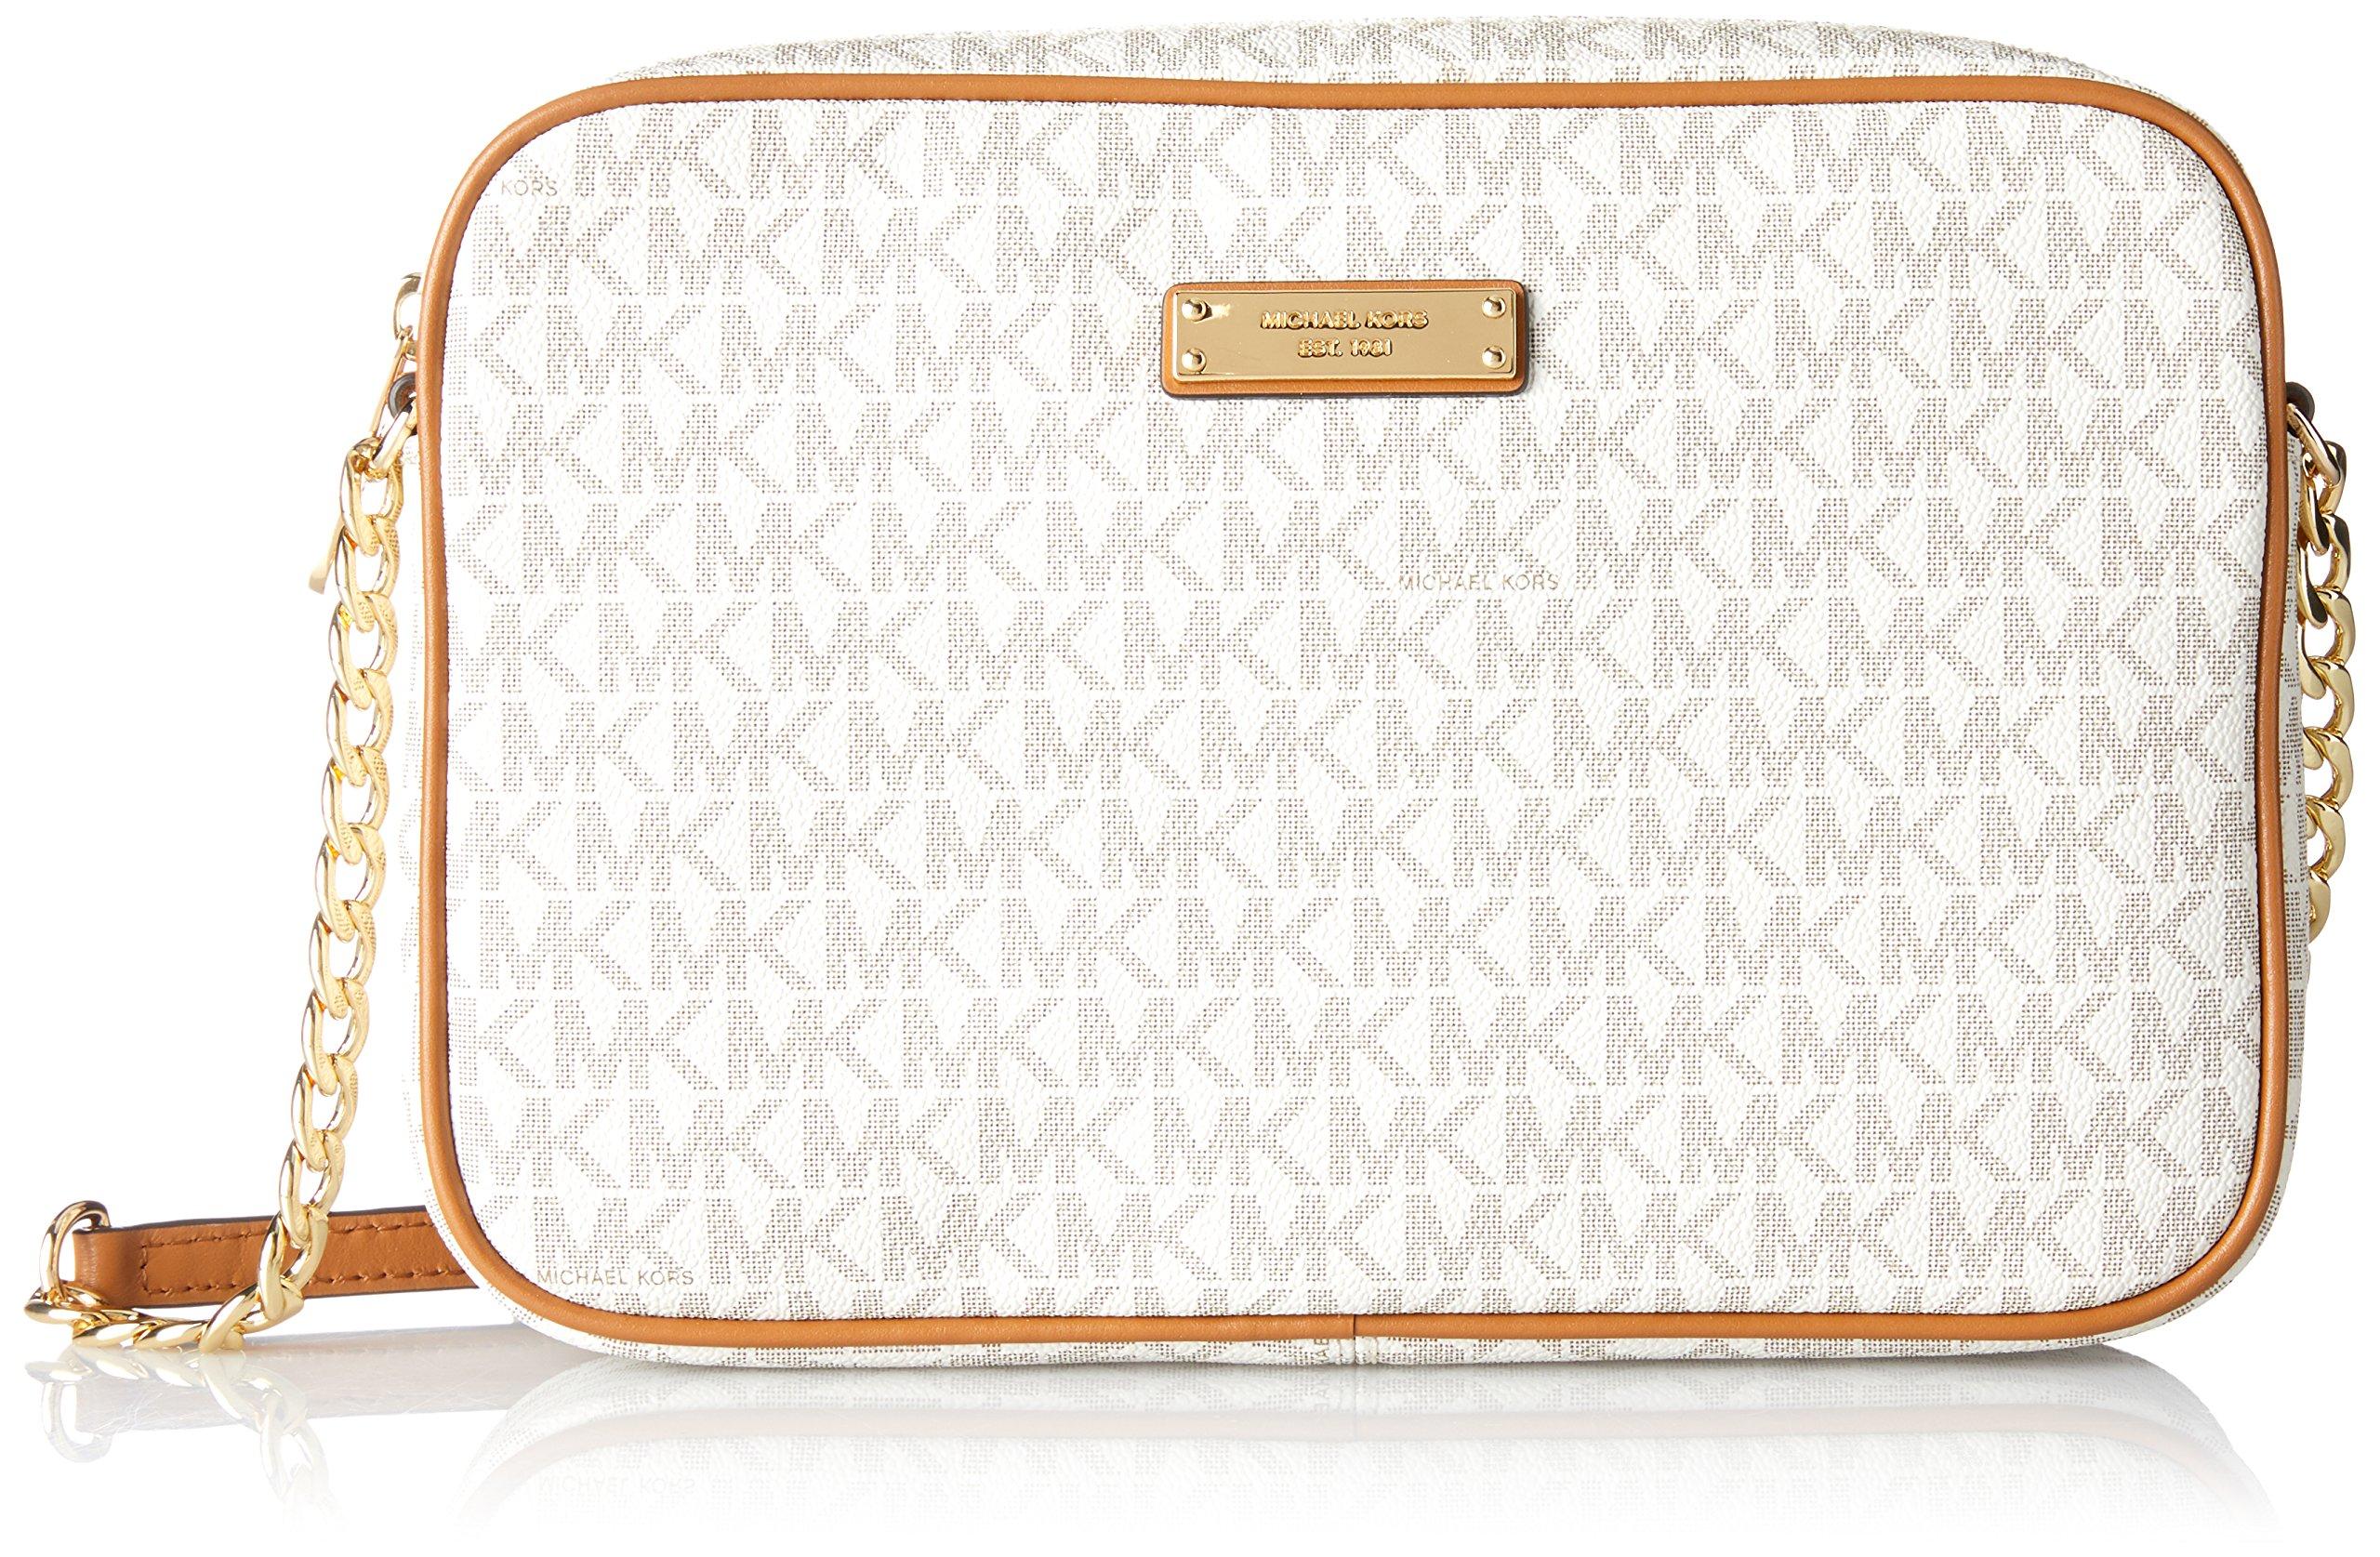 Michael Kors Women's Jet Set Large Crossbody Bag, Vanilla, OS